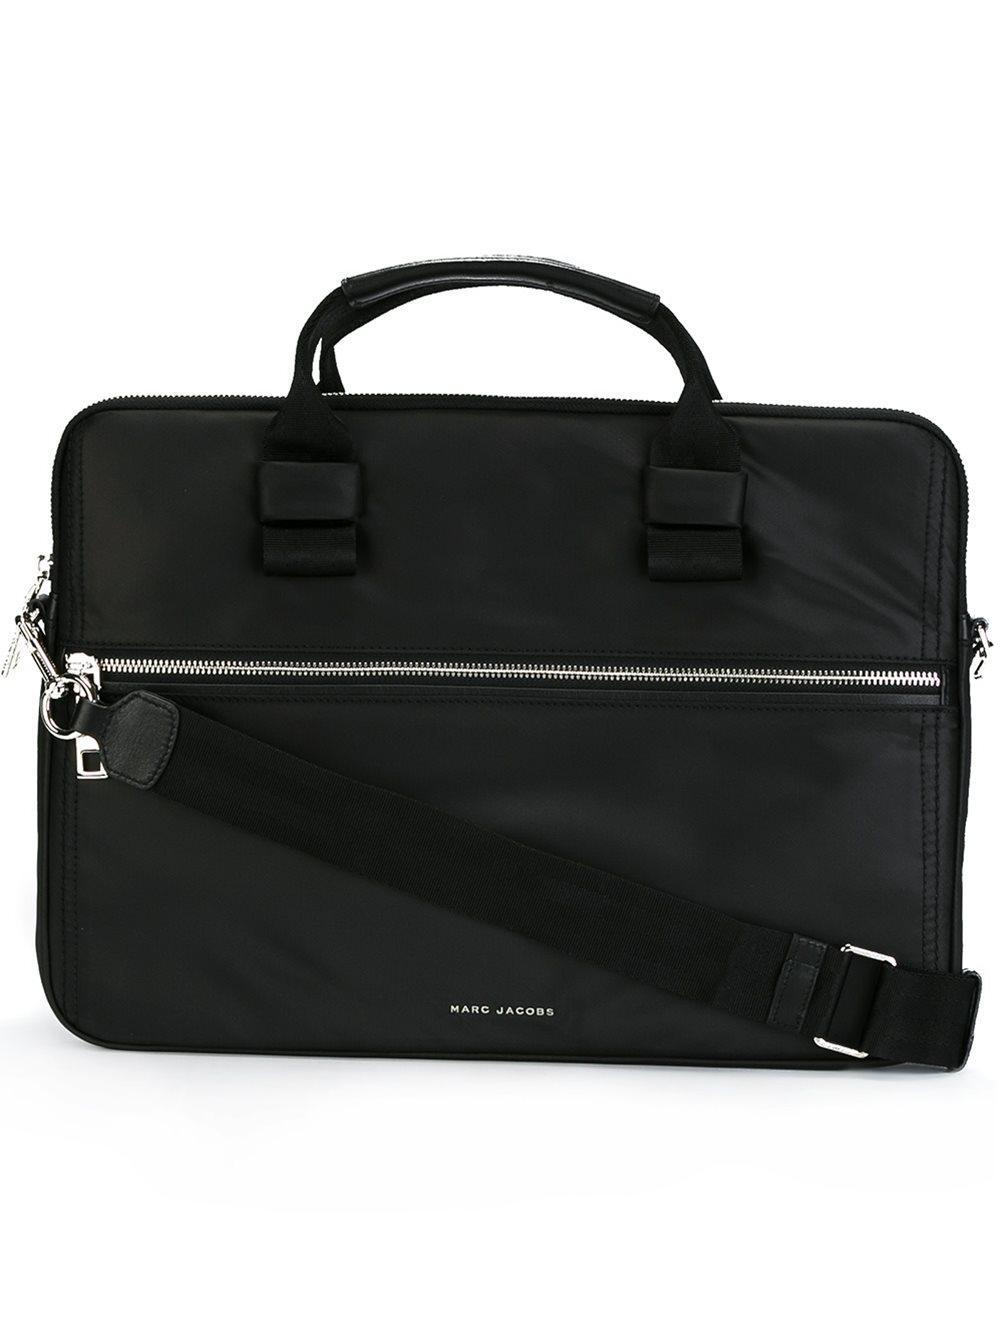 marc jacobs zipped laptop bag in black lyst. Black Bedroom Furniture Sets. Home Design Ideas